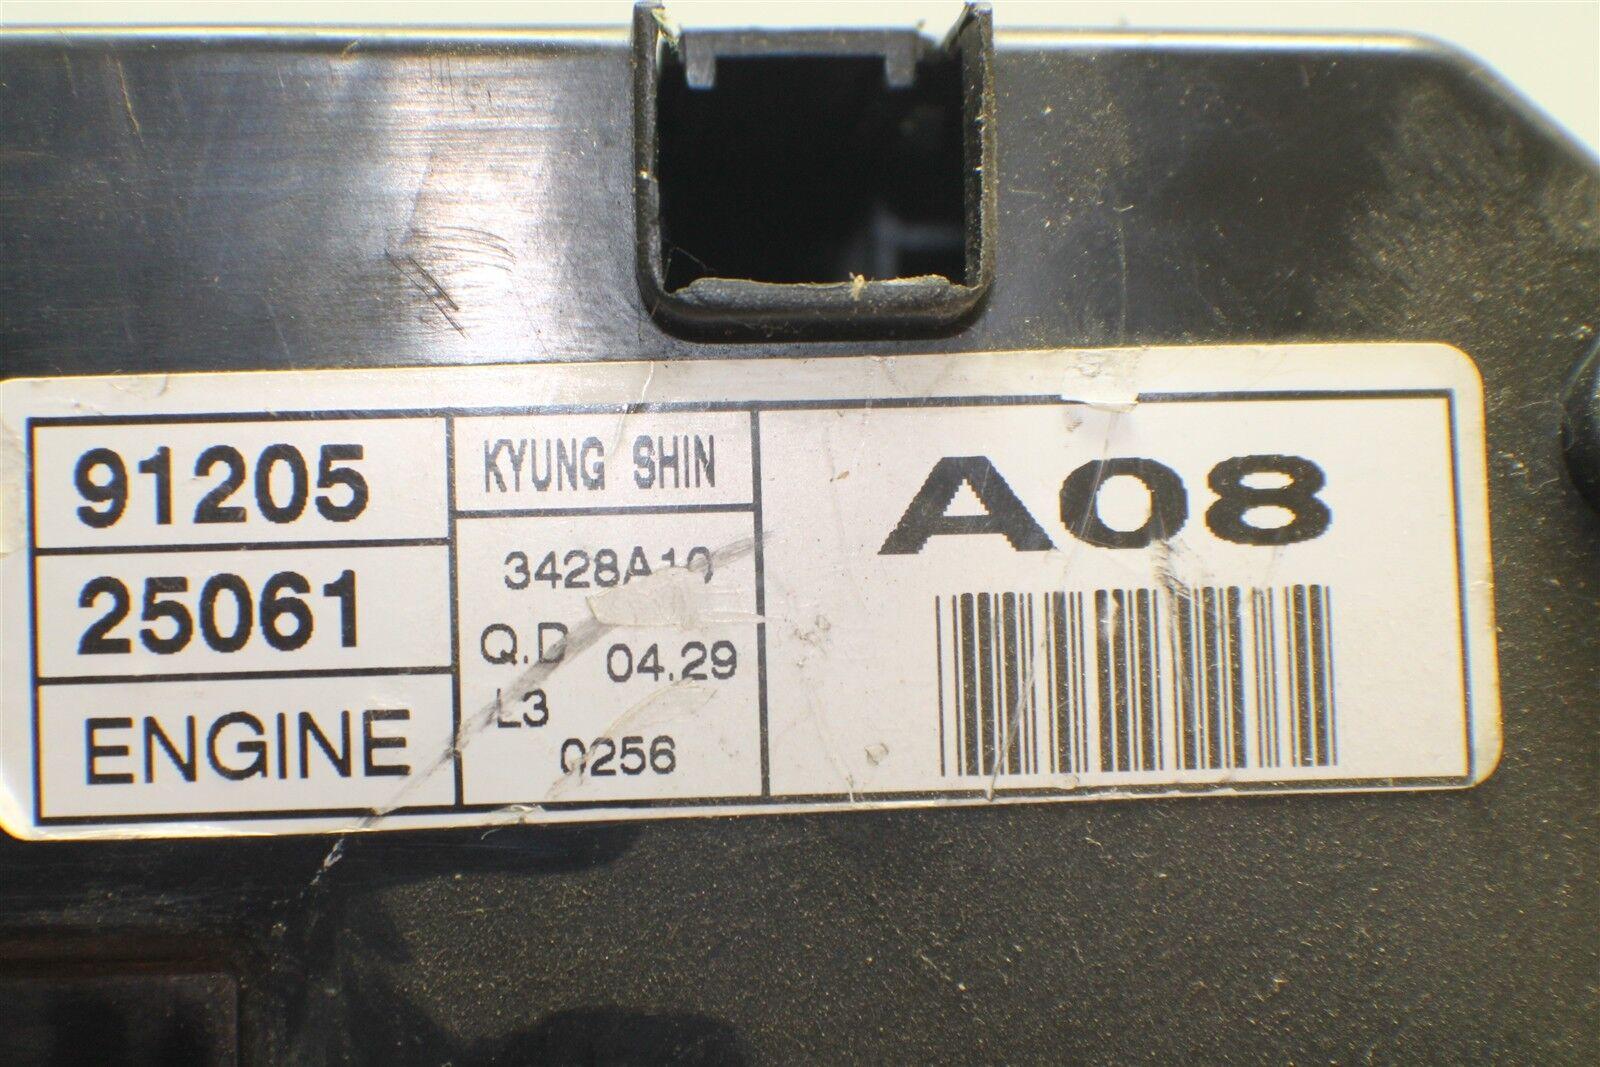 2002 2005 hyundai accent fuse box relay unit 9120525061 module 1926 12h3 [ 1600 x 1067 Pixel ]